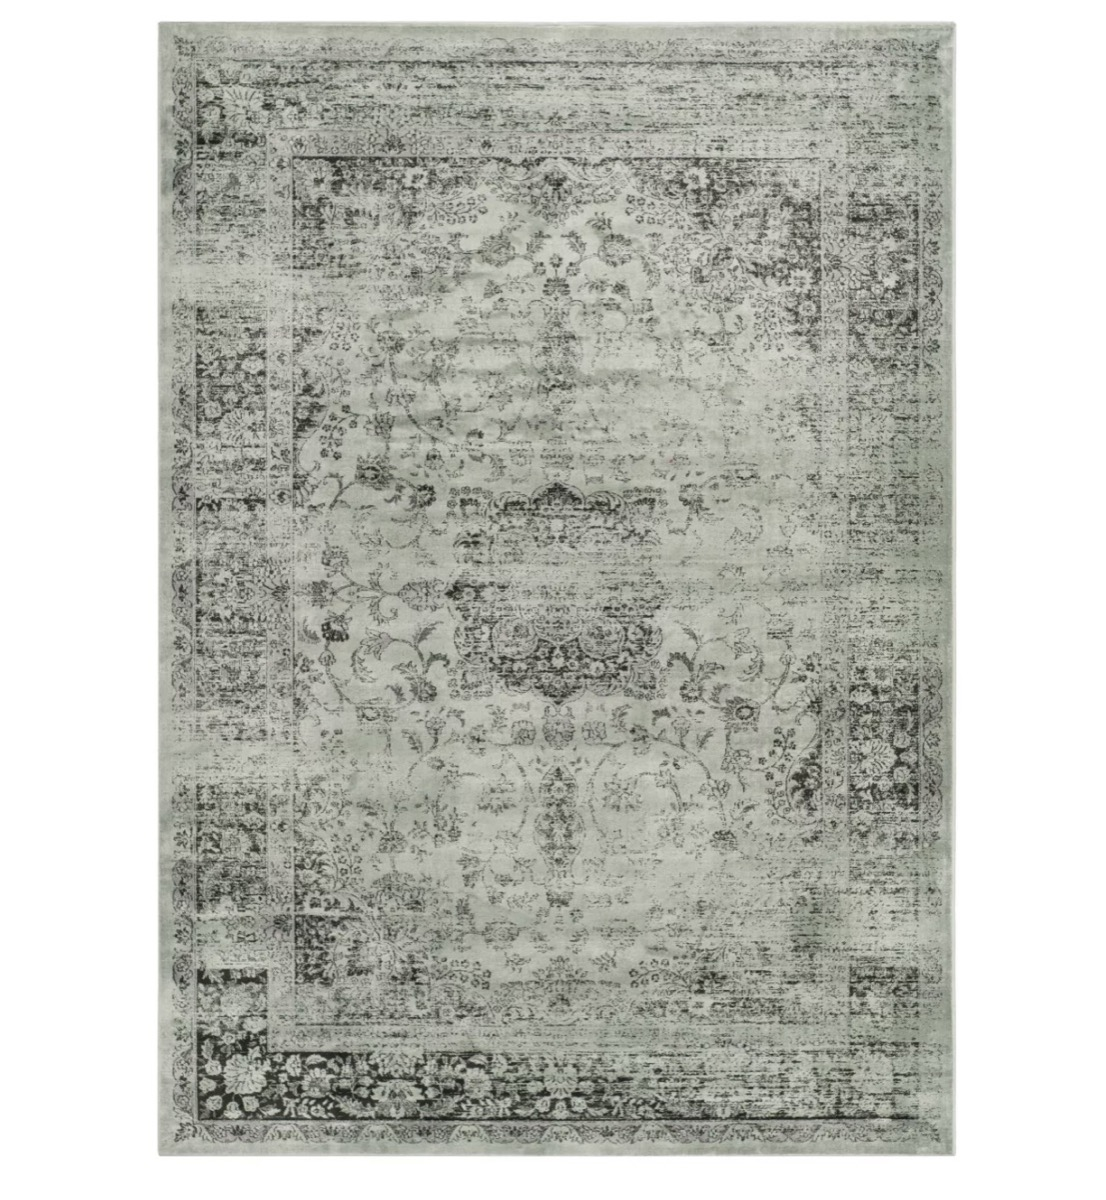 gray carpet on white background, target home decor items